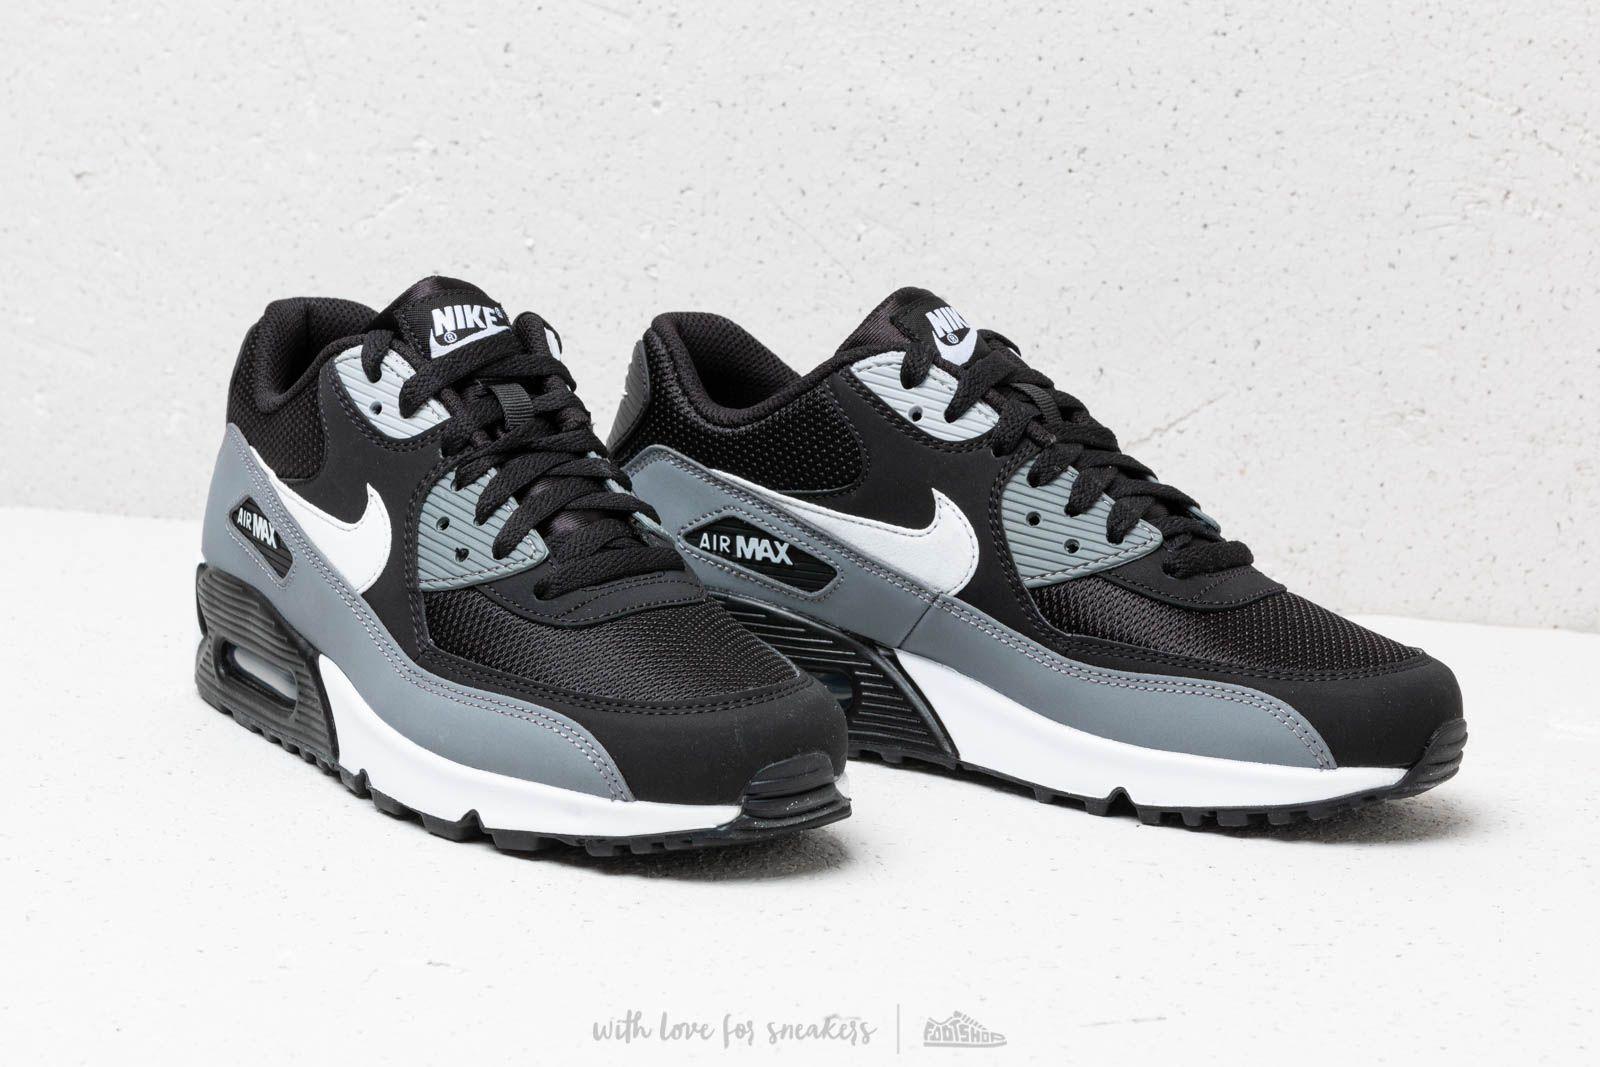 Nike Air Max 90 Essential Black White Cool Grey Anthracite | Footshop